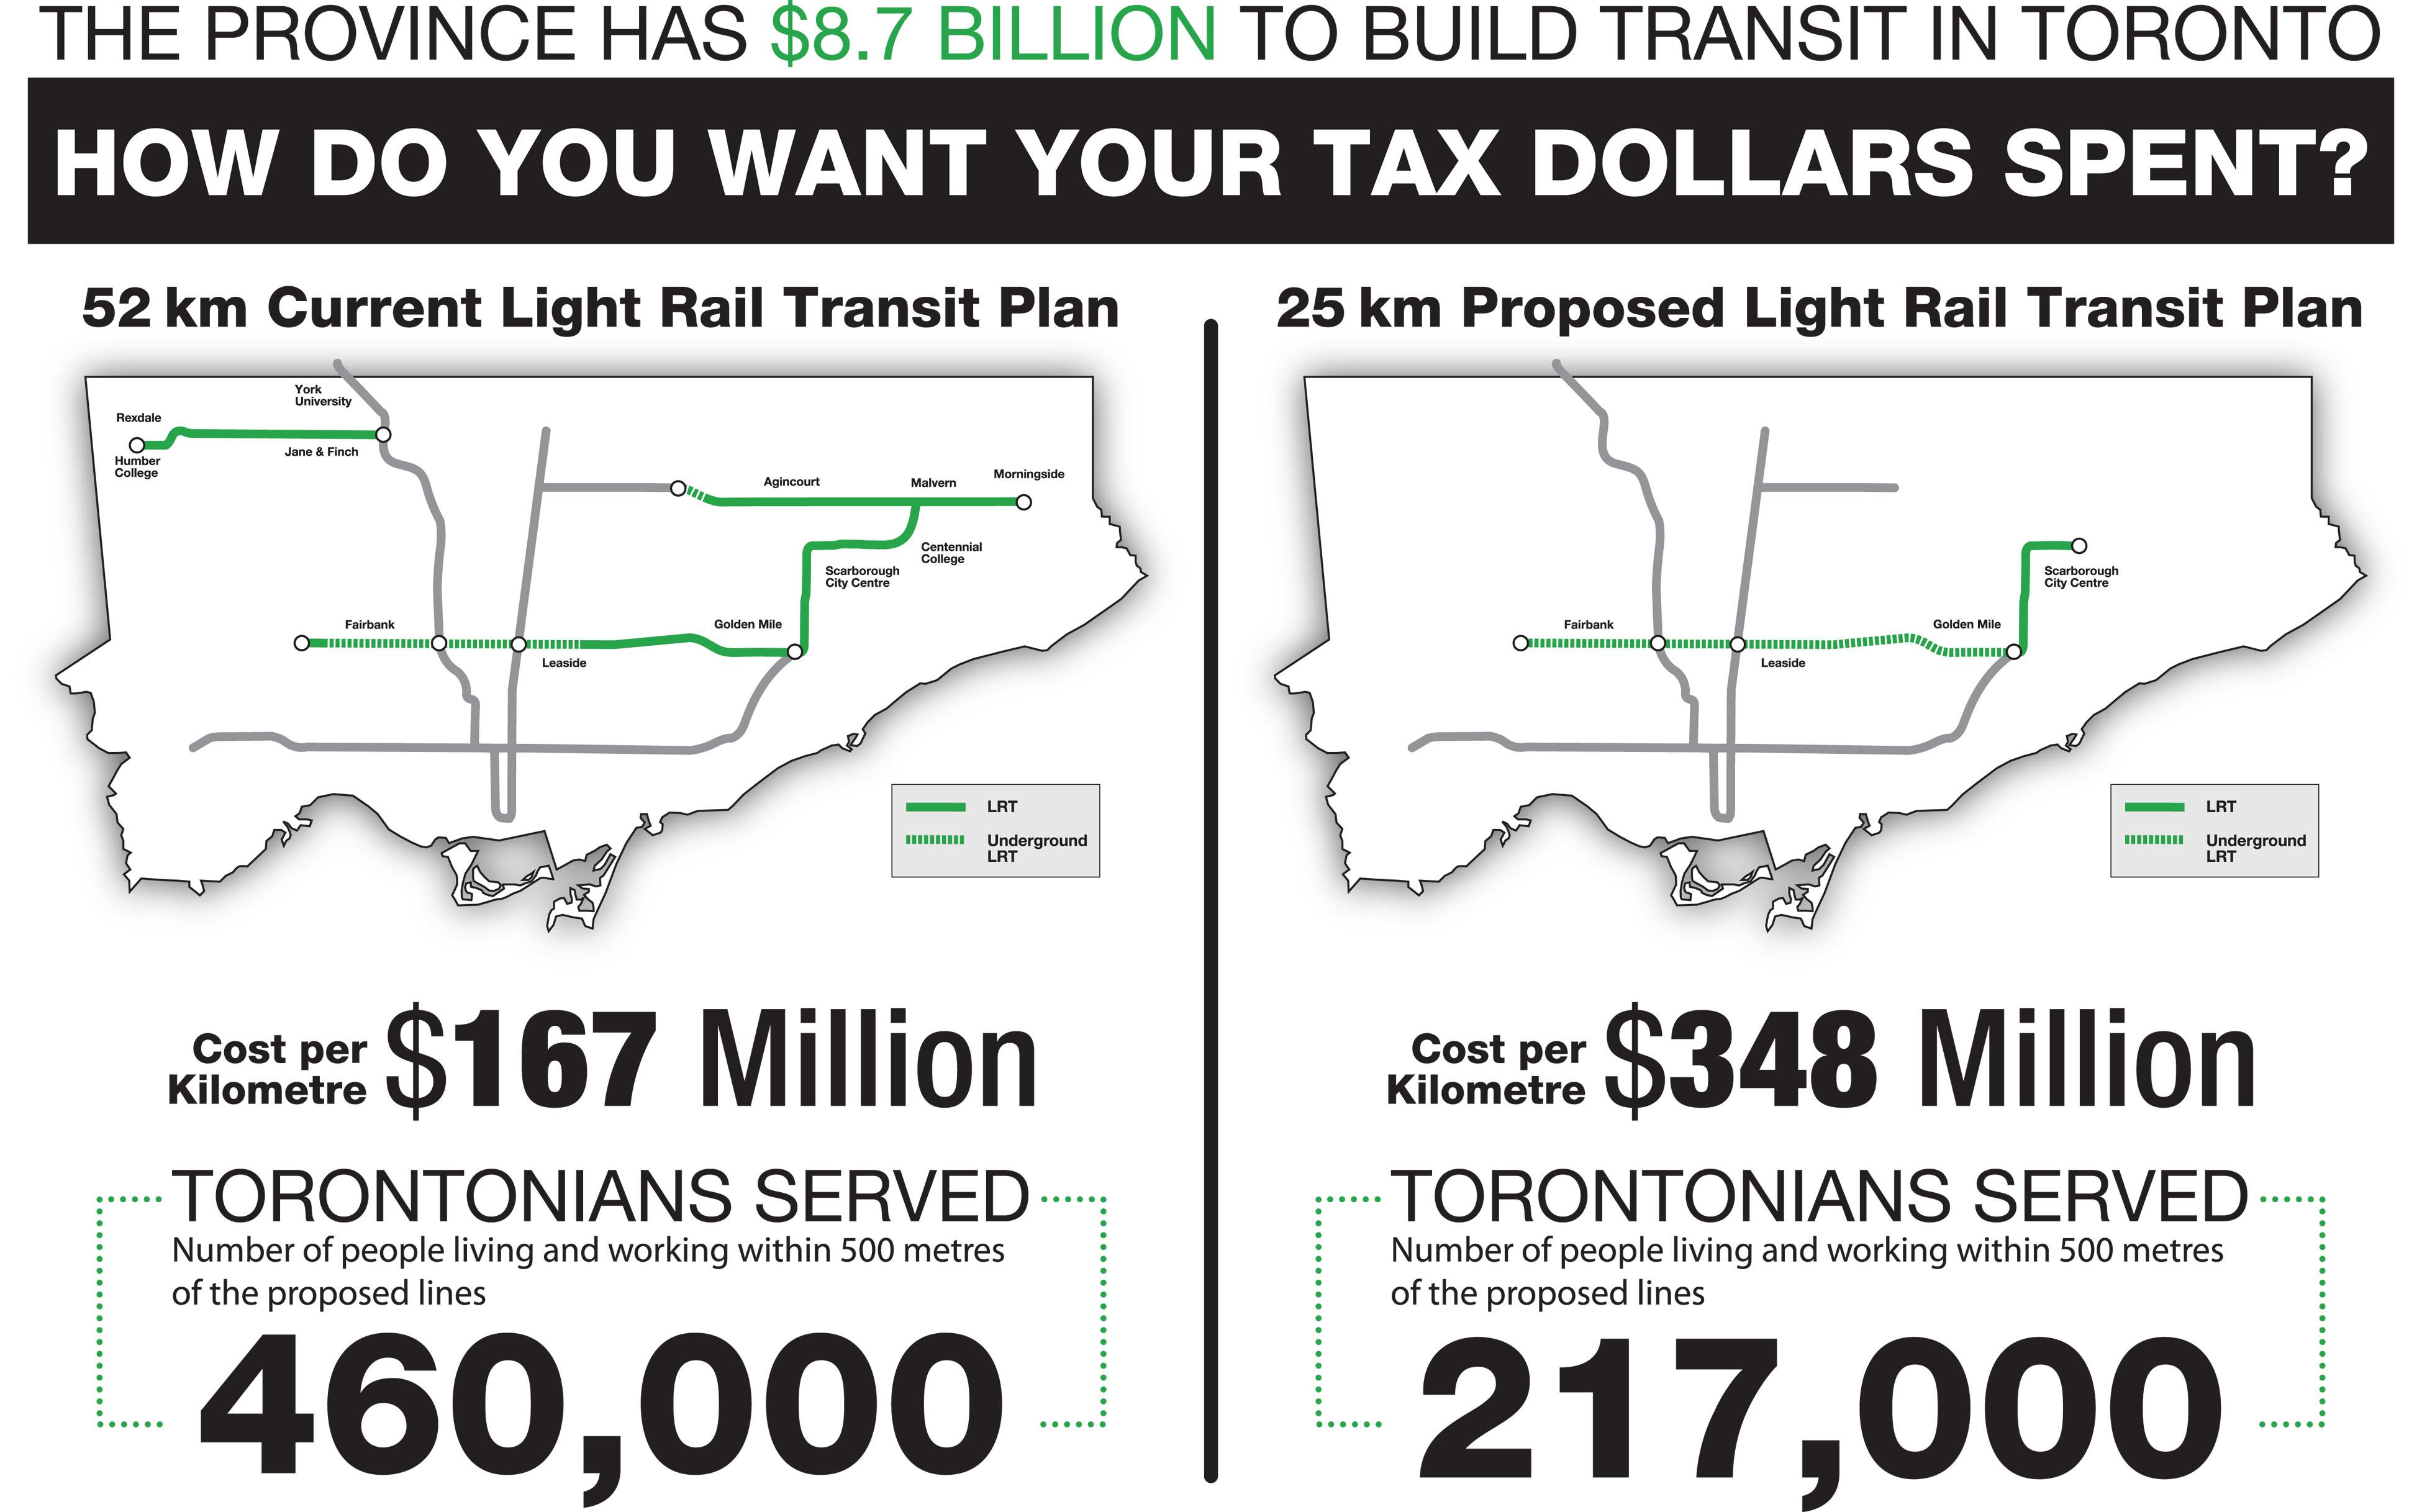 Toronto Subway Map Poster.Provincial Transit Funding Leaves Suburbs Behind 2011 Toronto